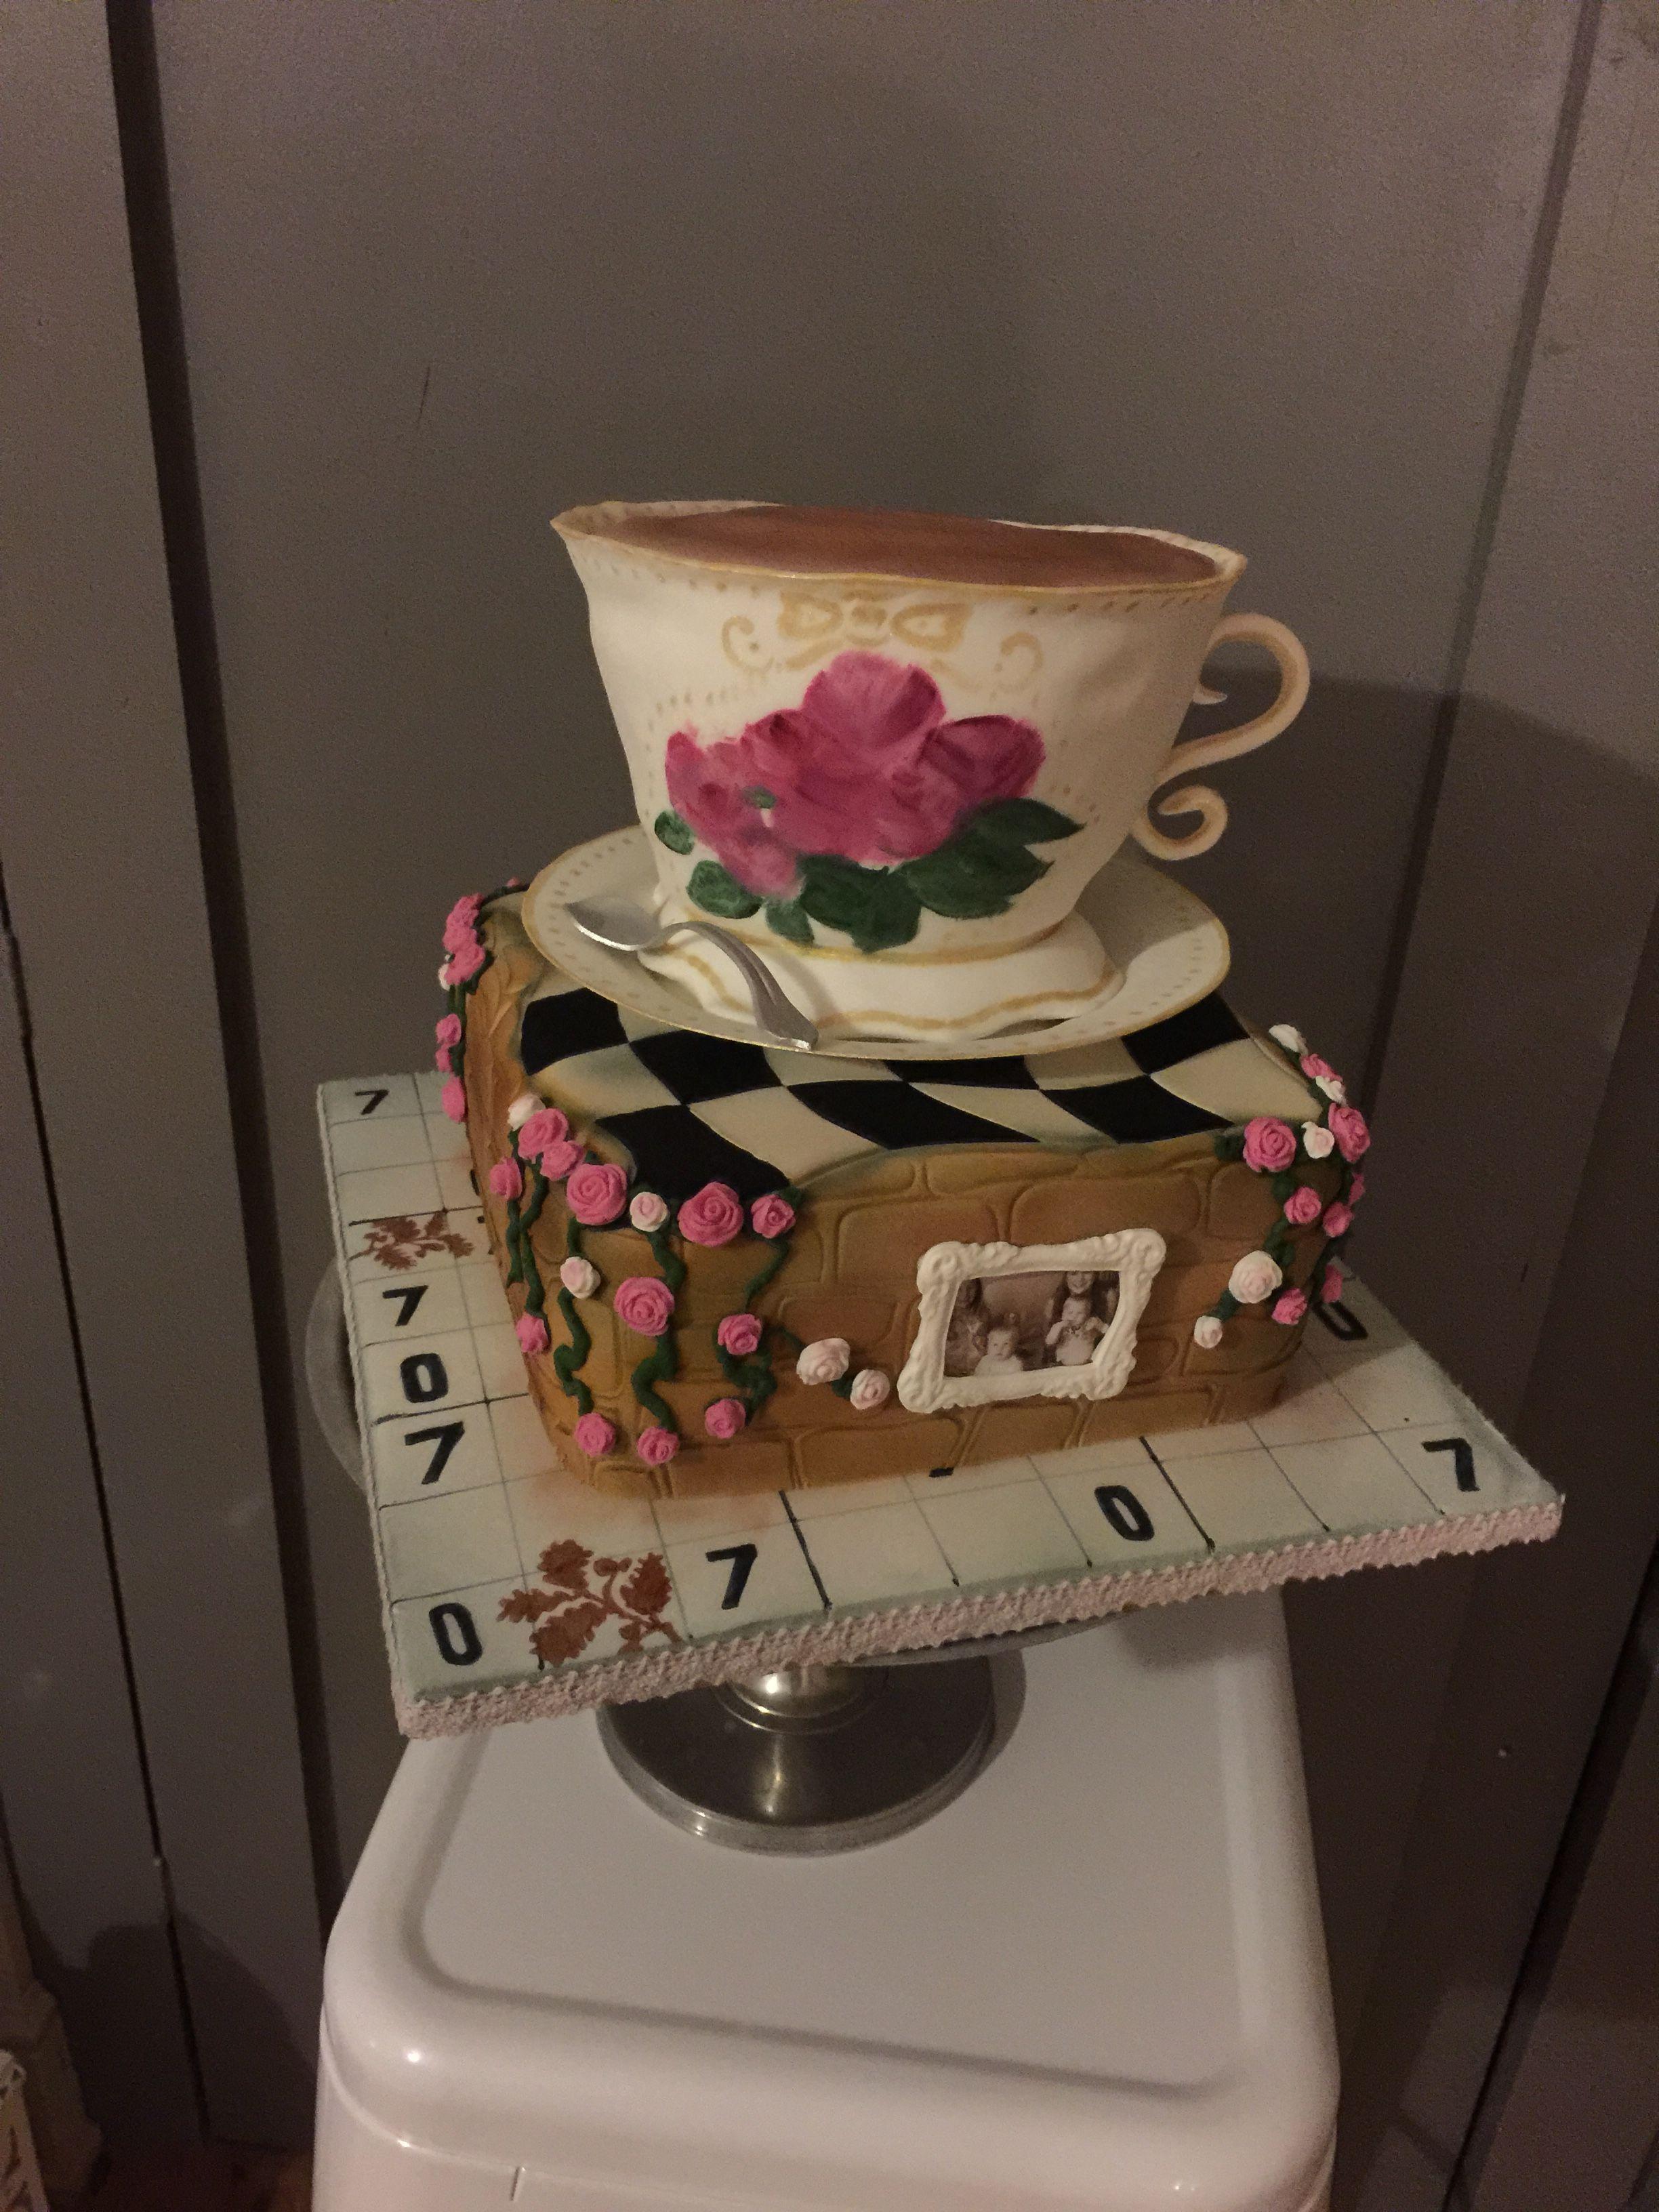 70th Birthday Cake, Suduko, national trust, flowers, formular one ...